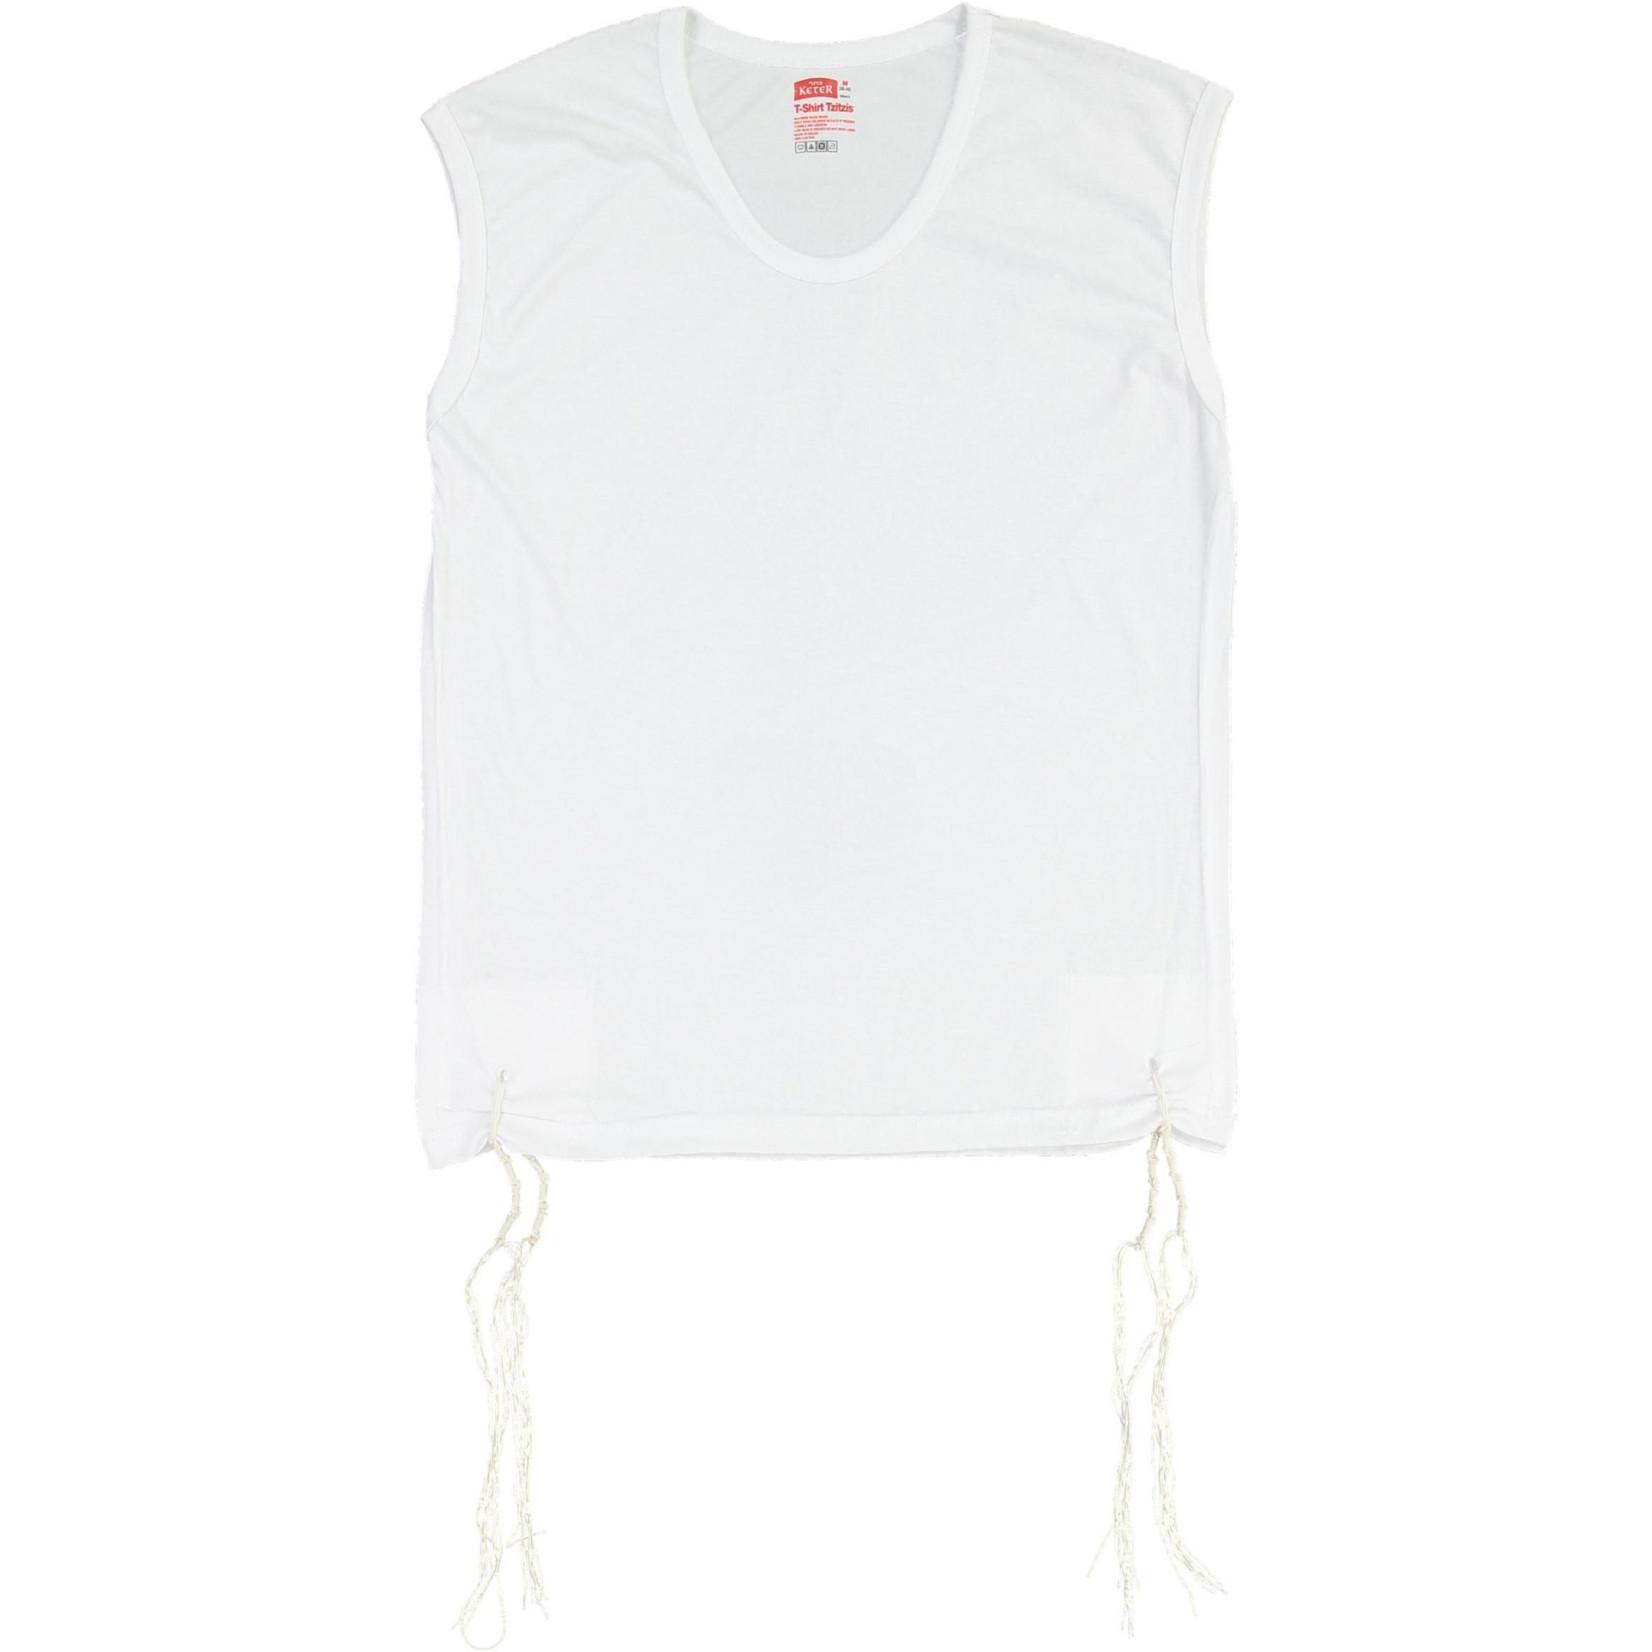 Undershirt-Style Arbah Kanfot, 100% Cotton, Round Neck, Size XS